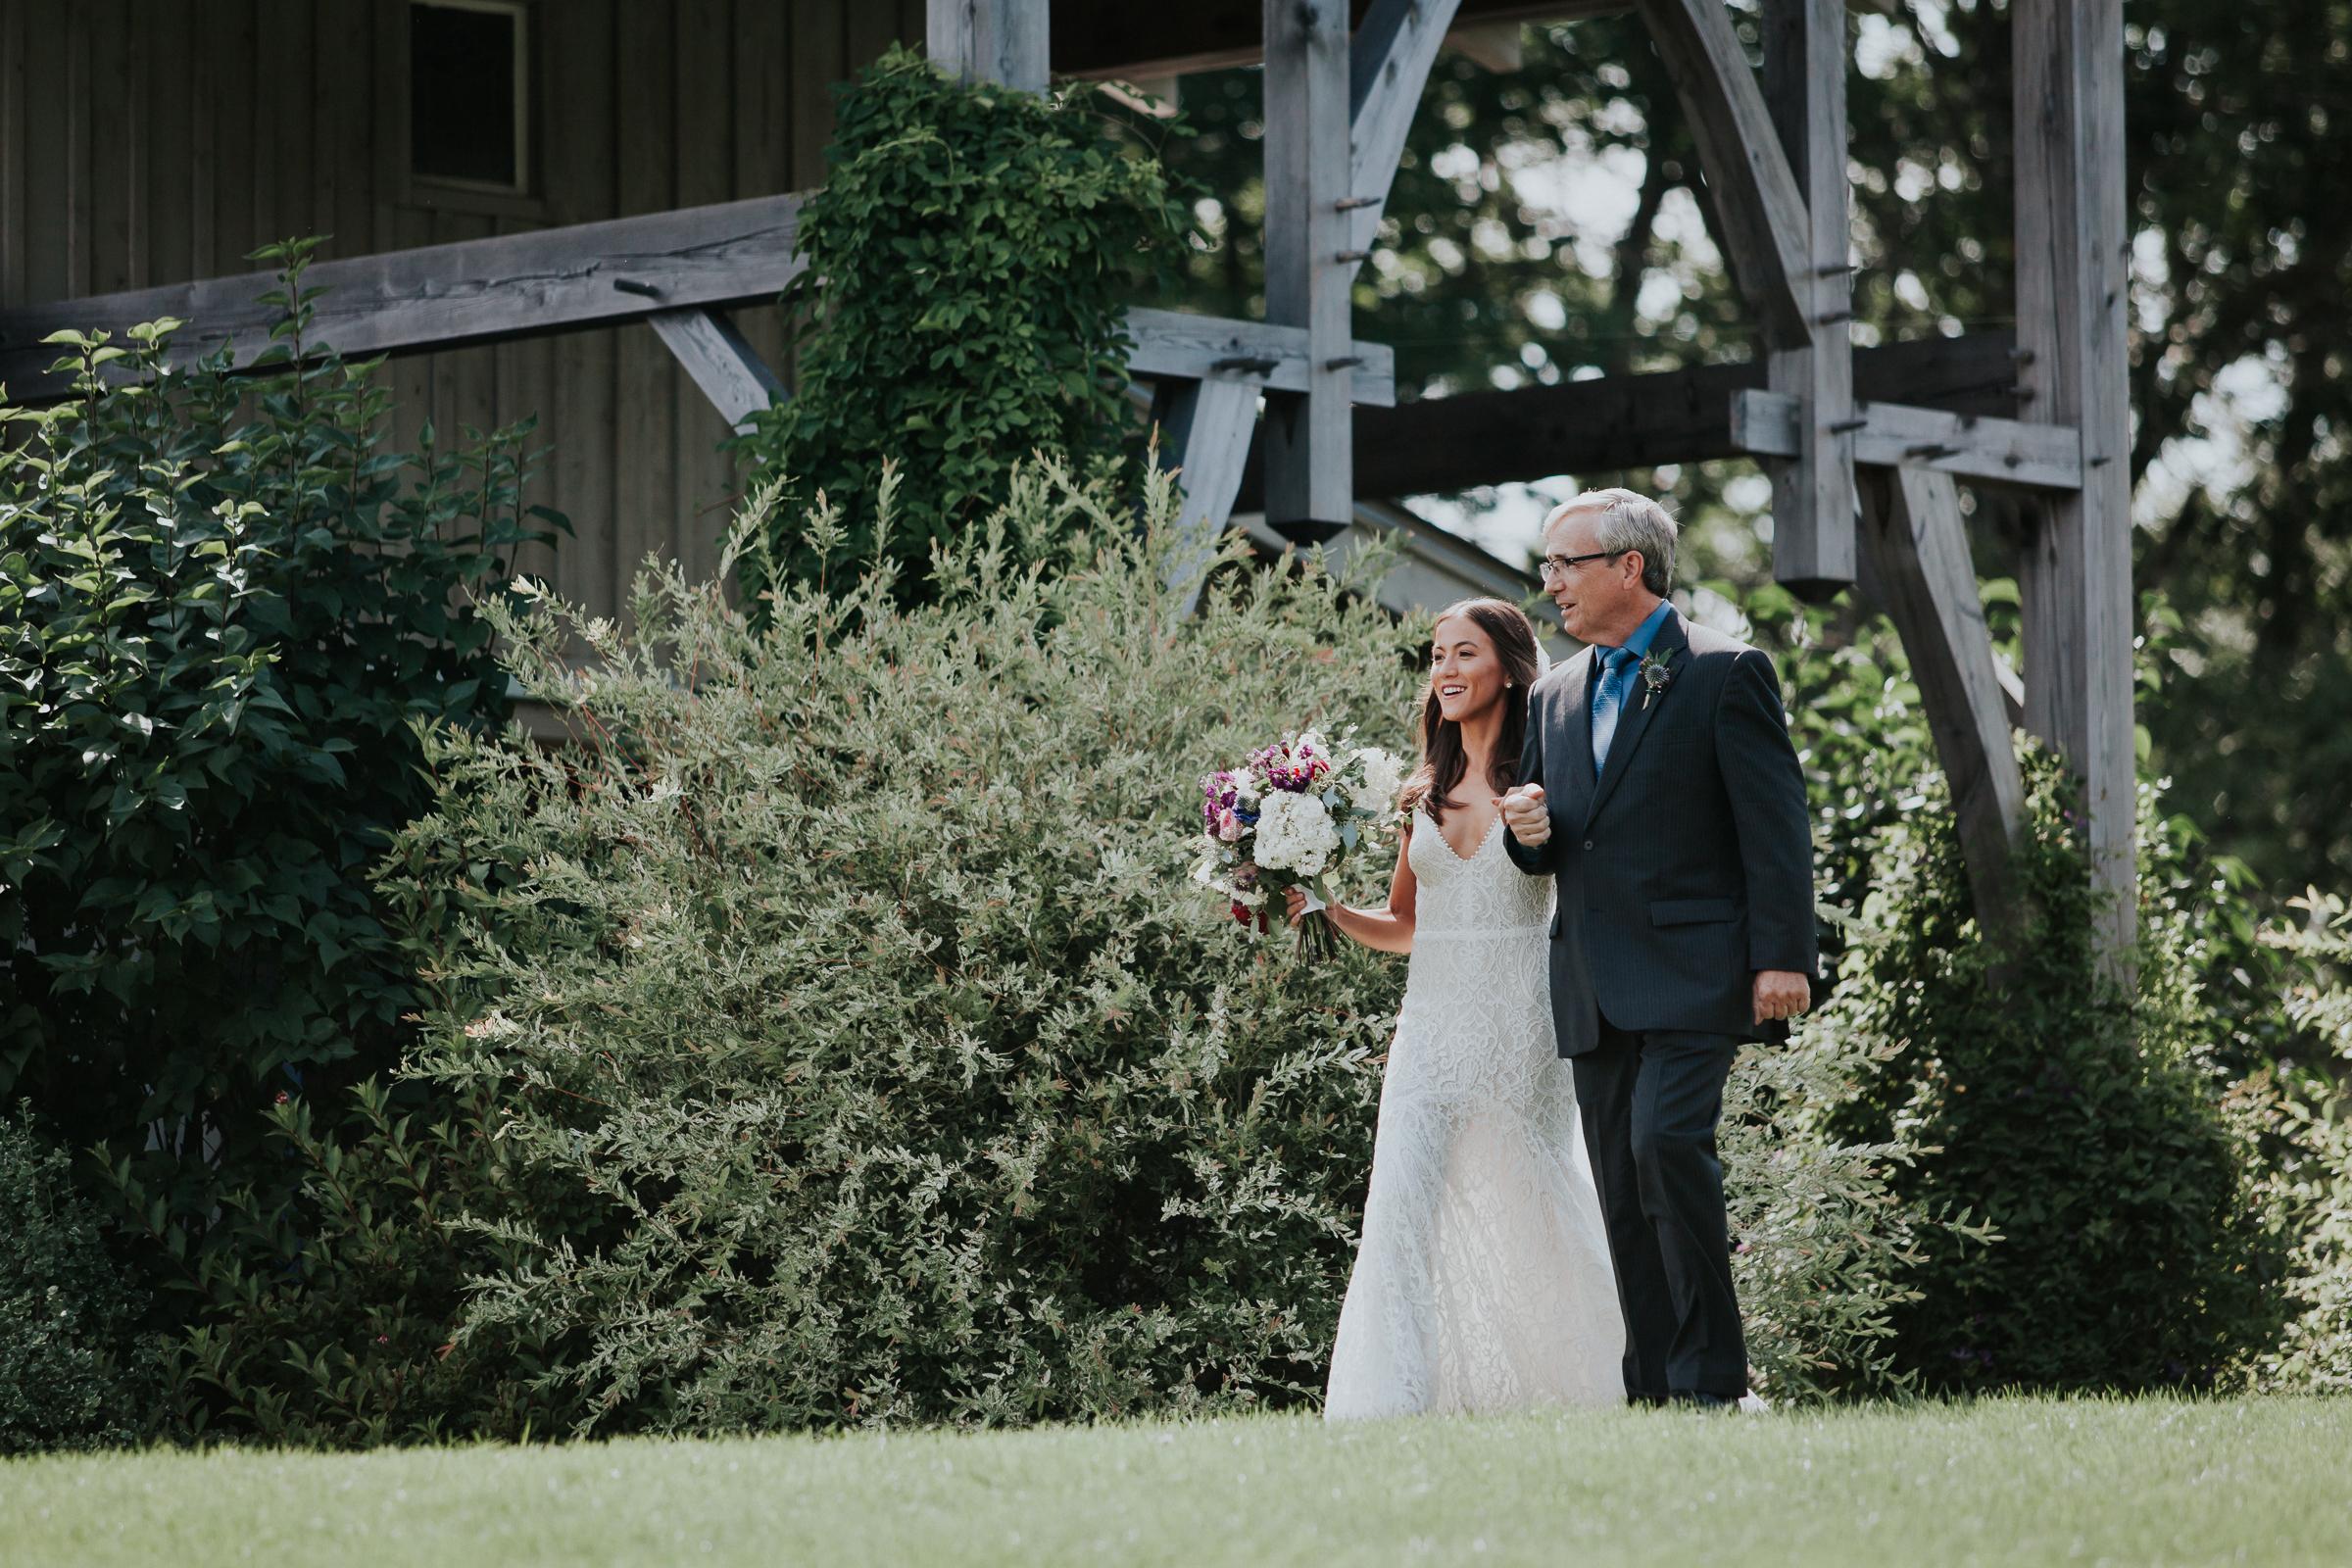 Marianmade-Farm-Wiscasset-Maine-Fine-Art-Documentary-Wedding-Photographer-Elvira-Kalviste-Photography-72.jpg